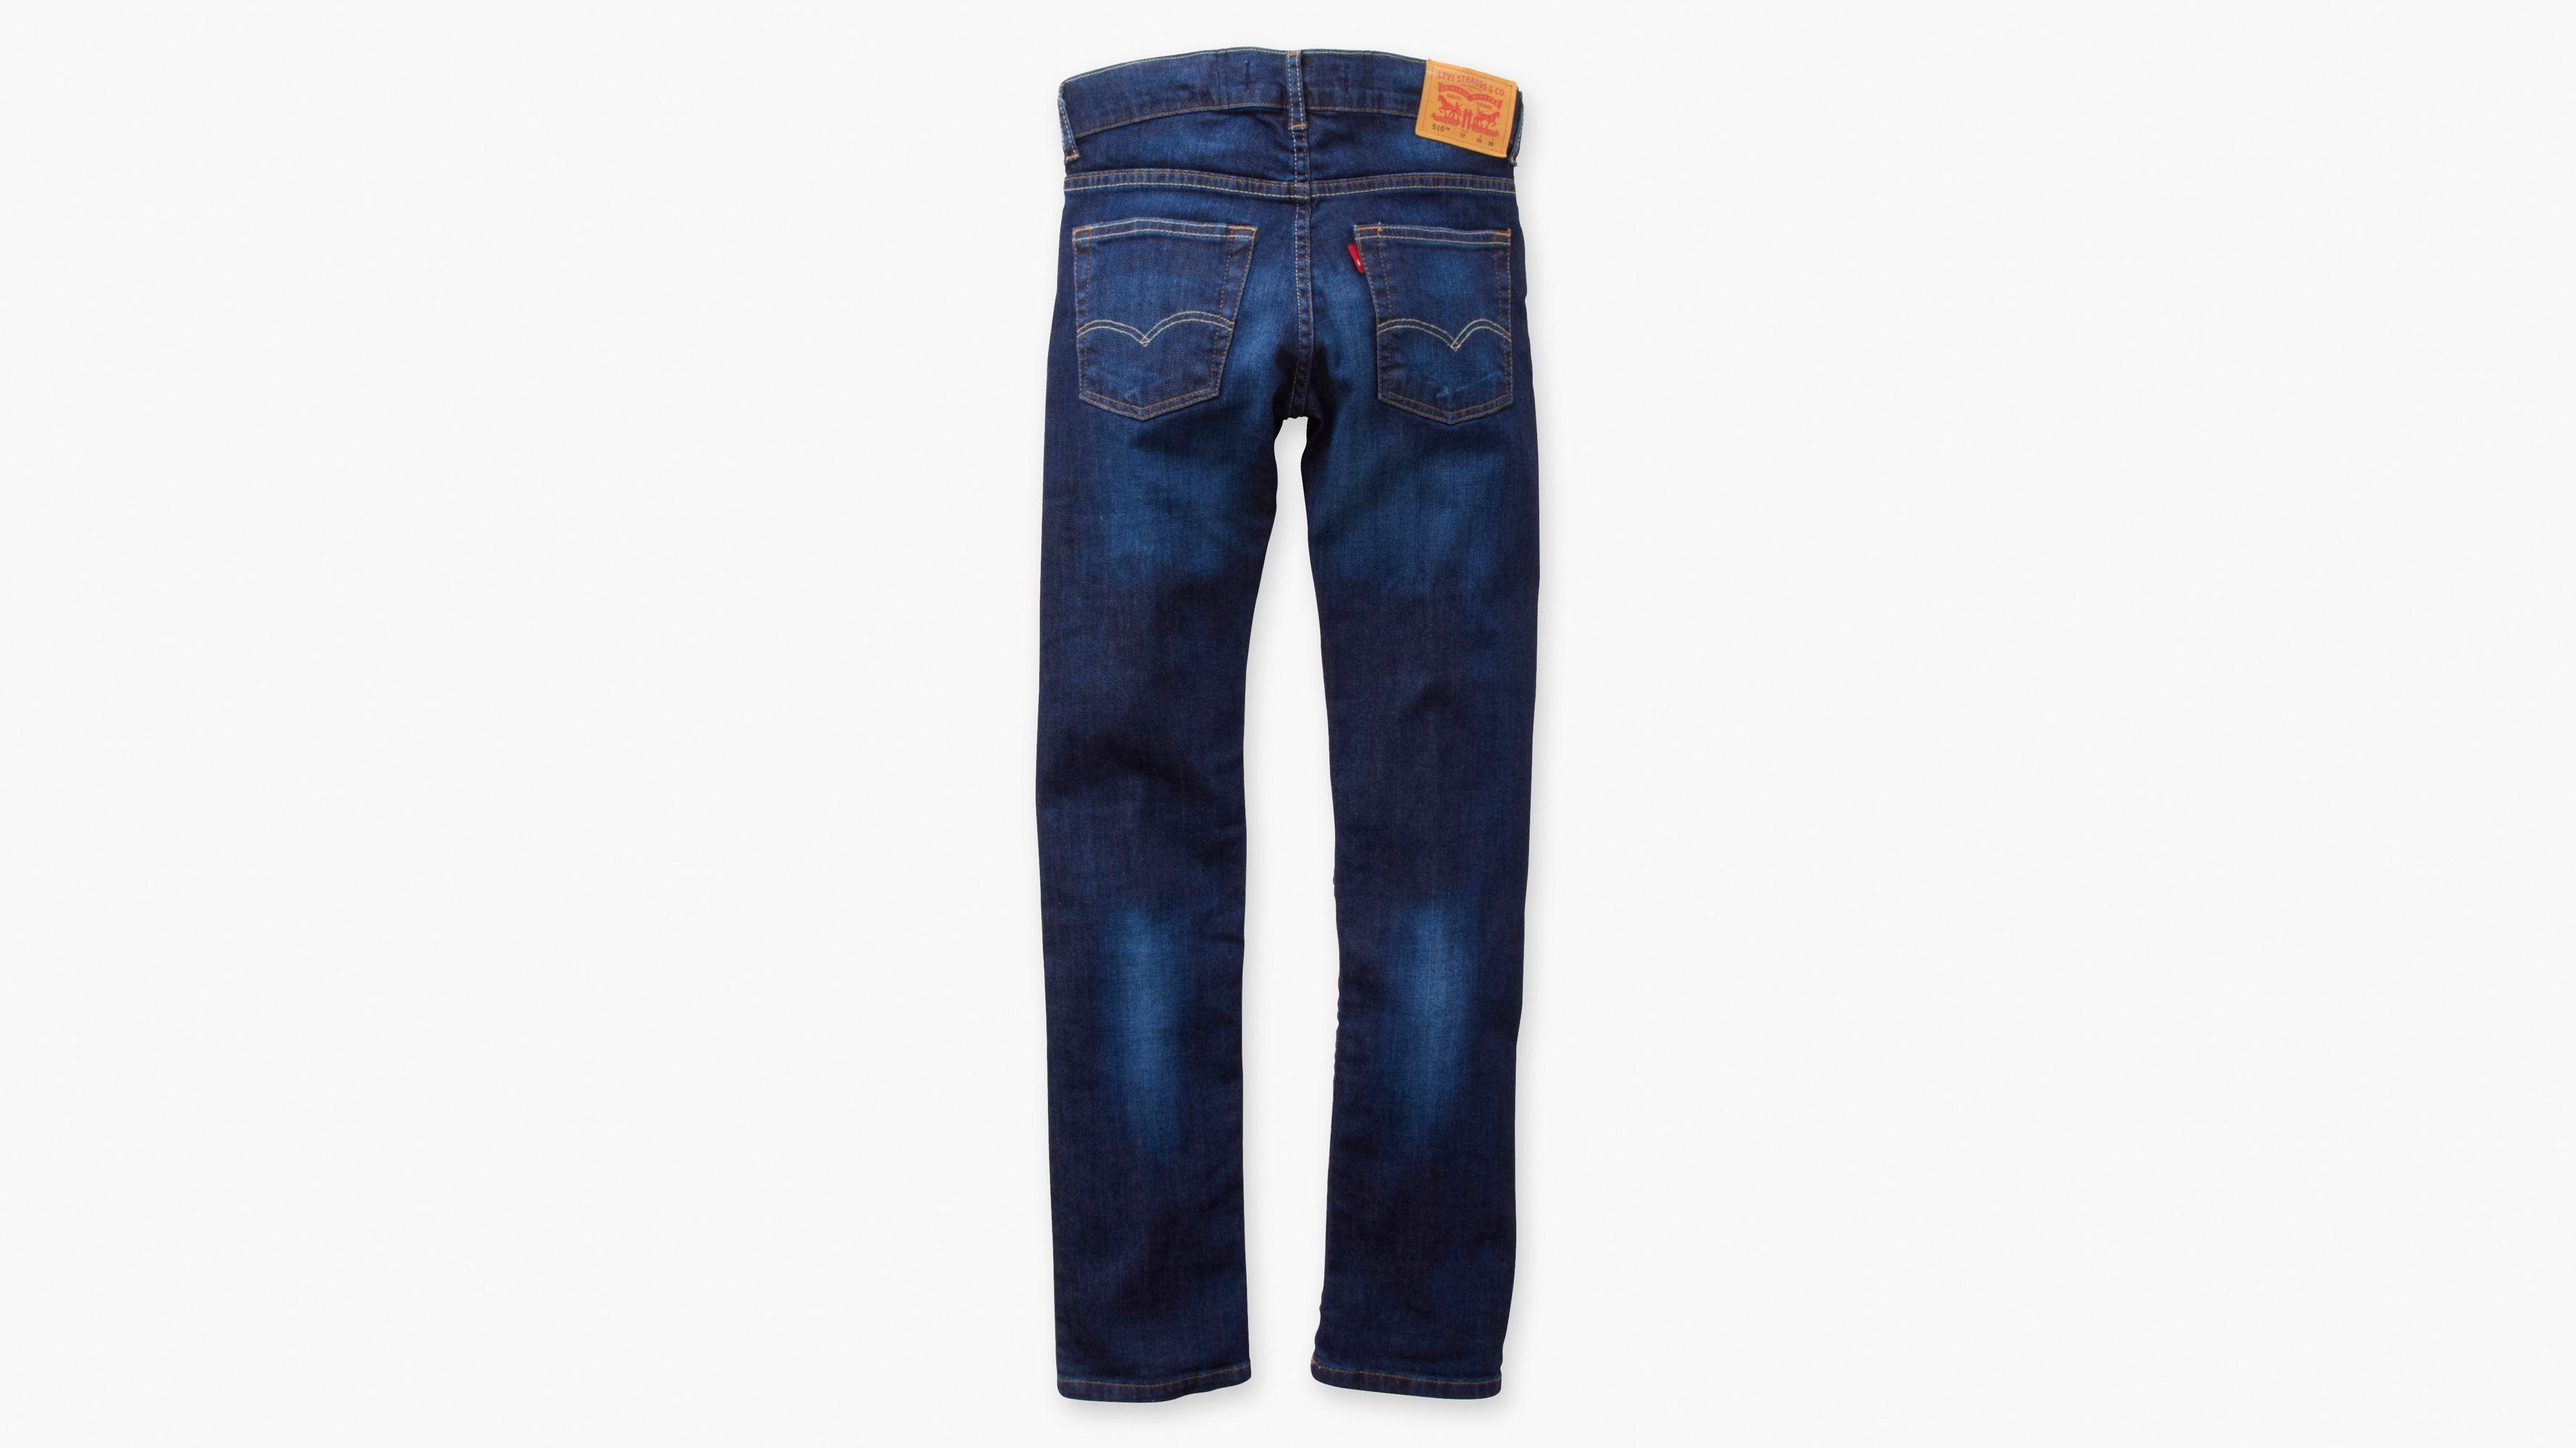 39a4389c Boys 510™ Skinny Fit Jeans - Blå | Levi's® DK